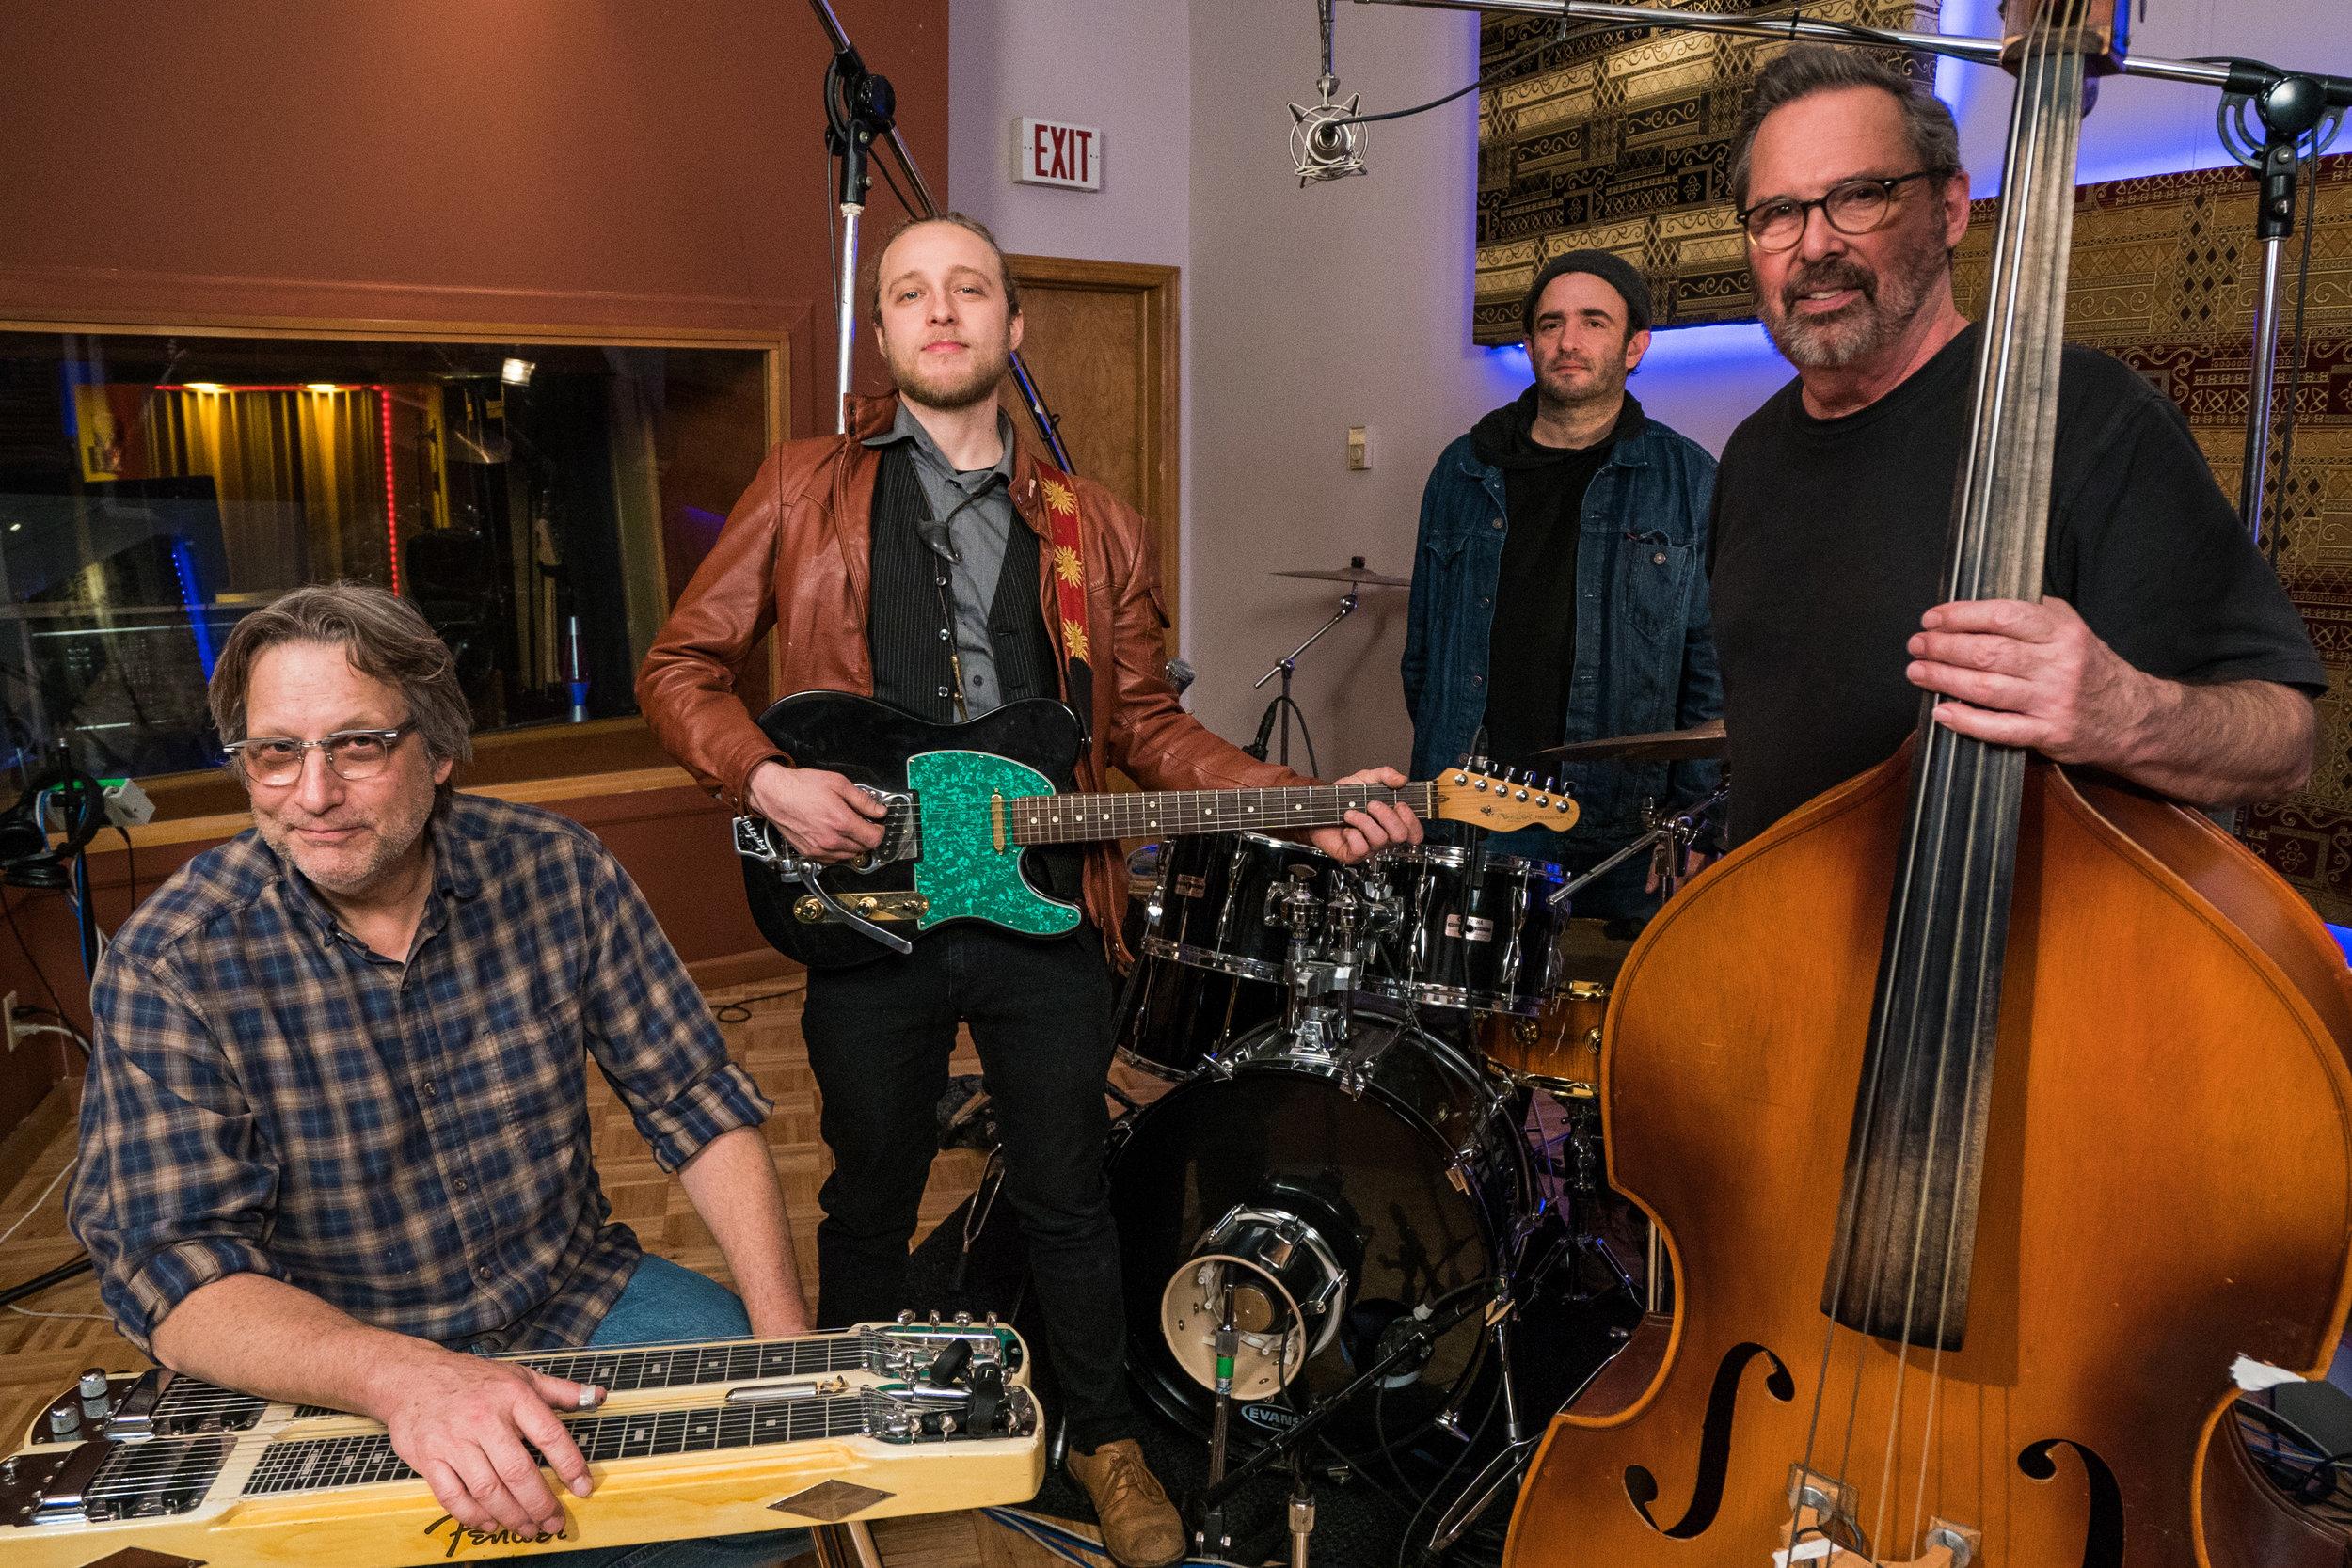 Aaron Lipp & The Slack Tones